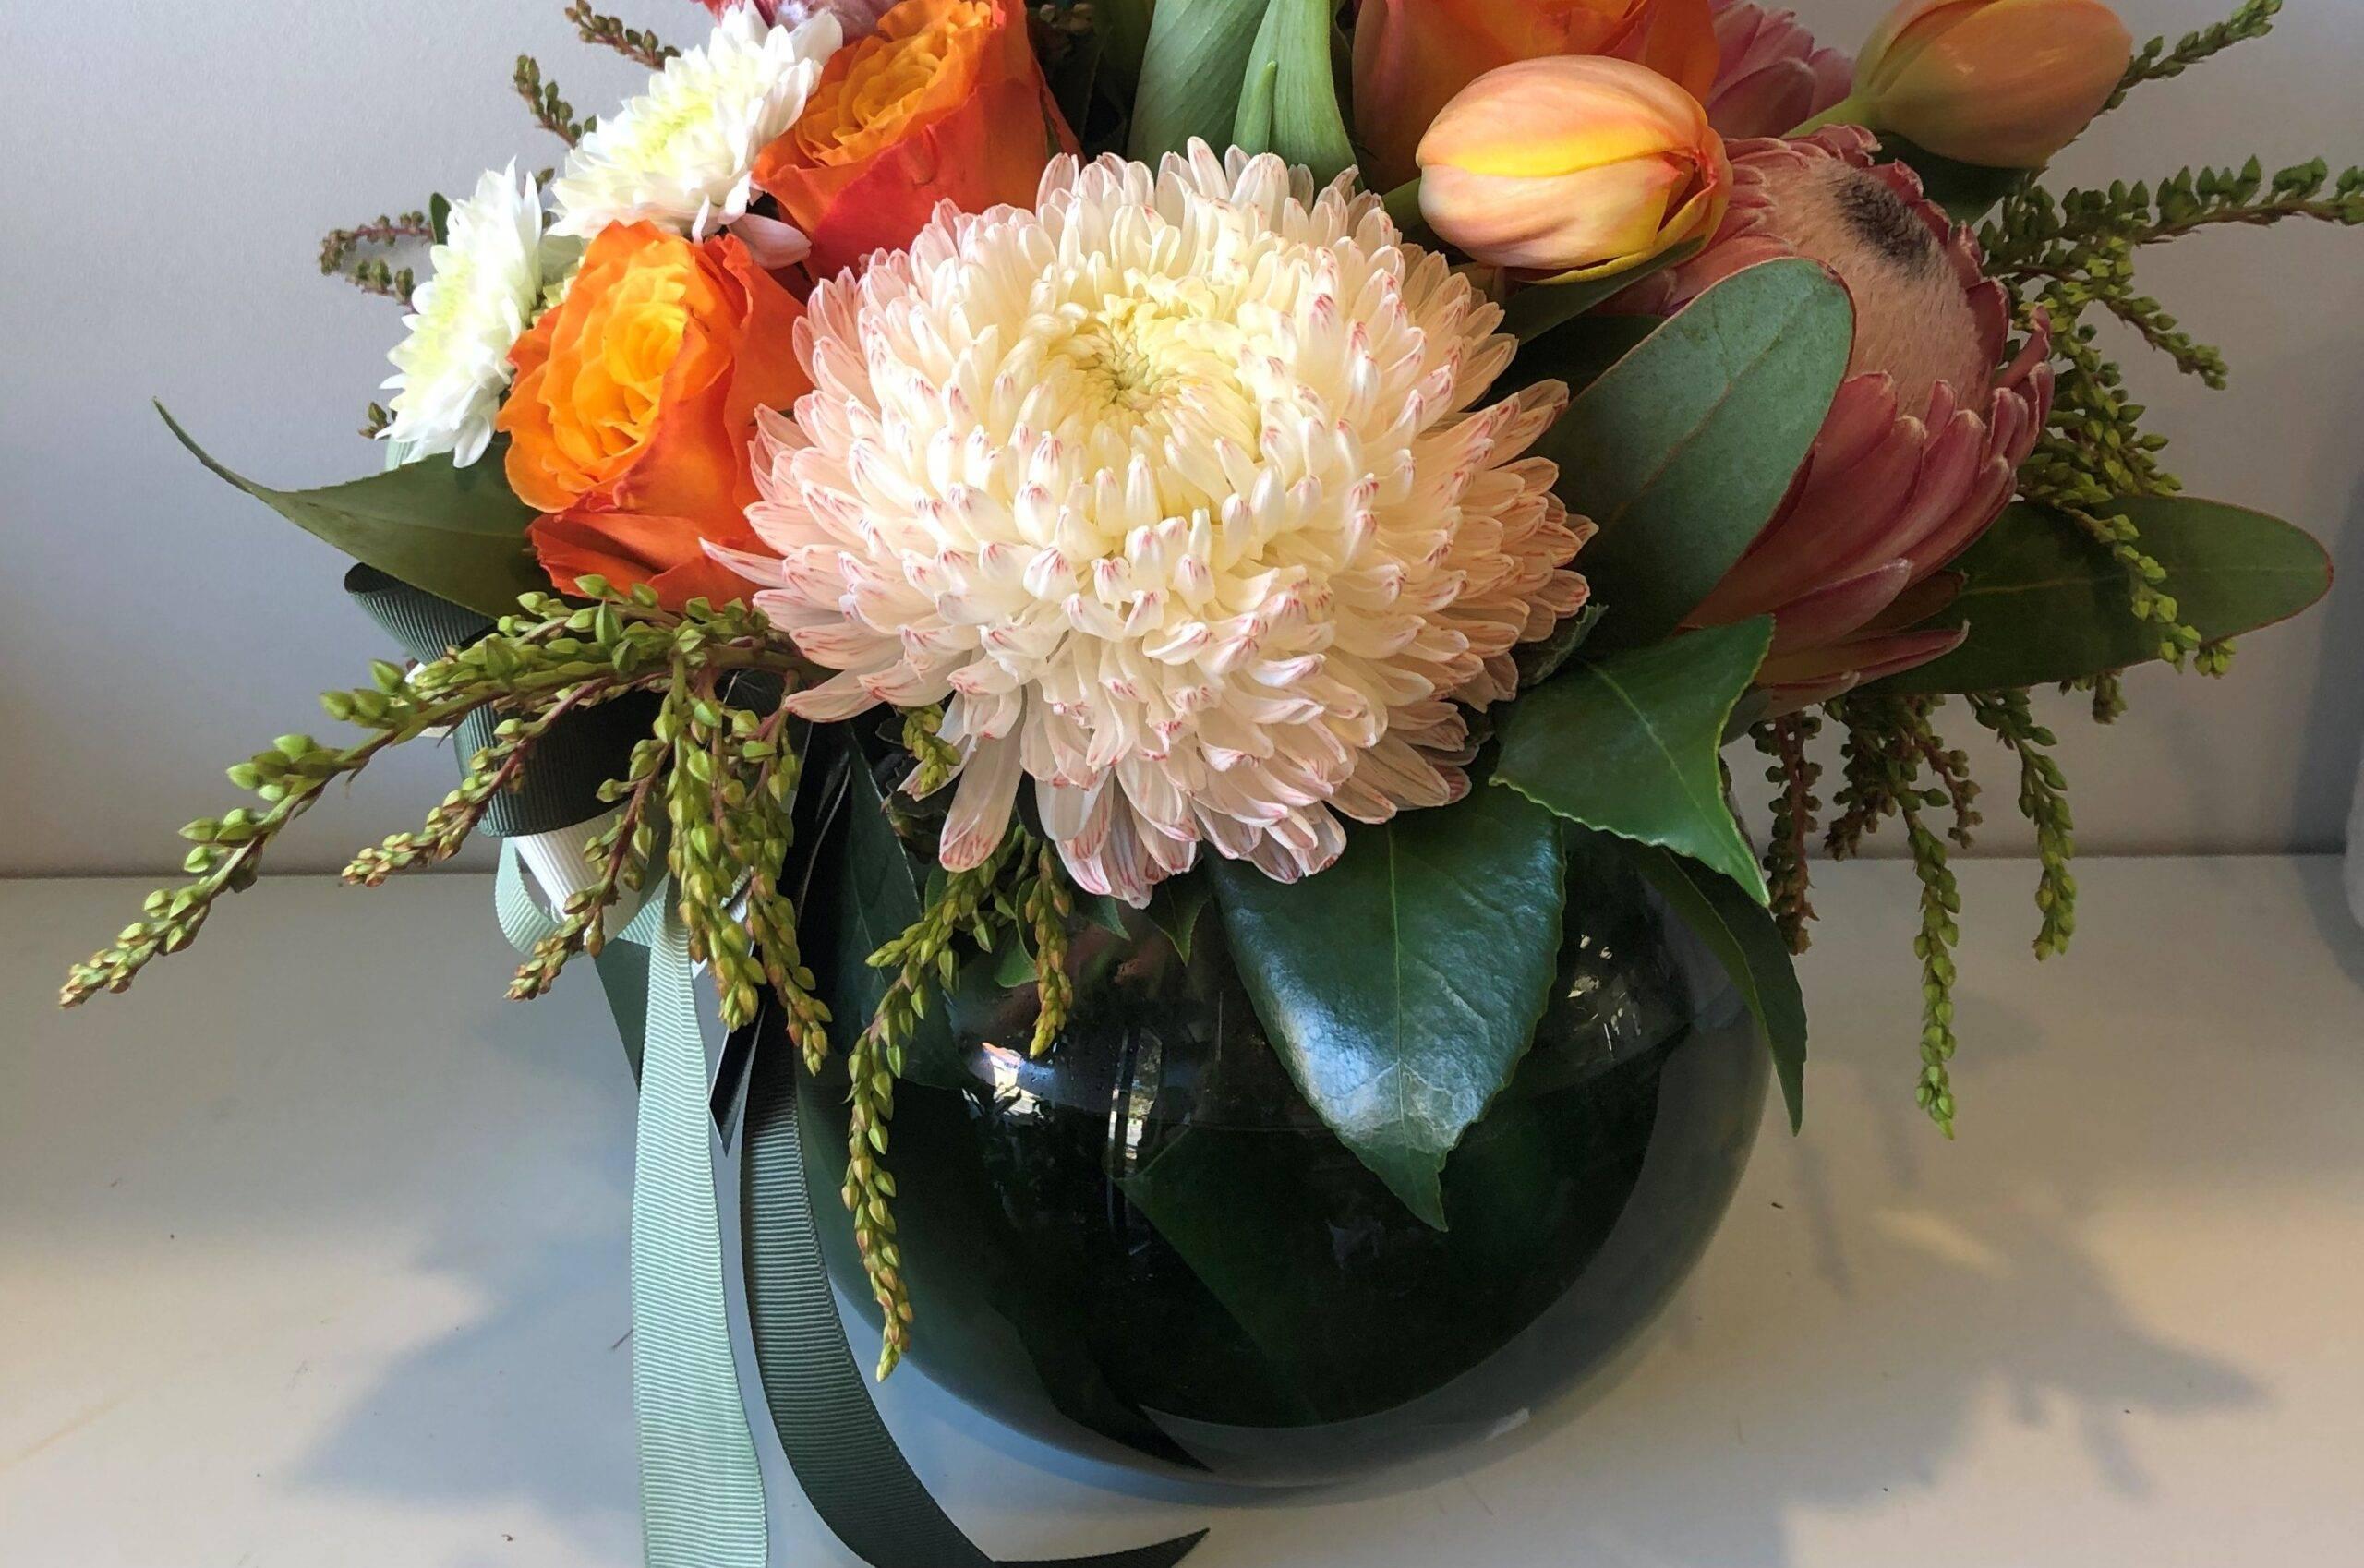 fishbowl vase arrangement